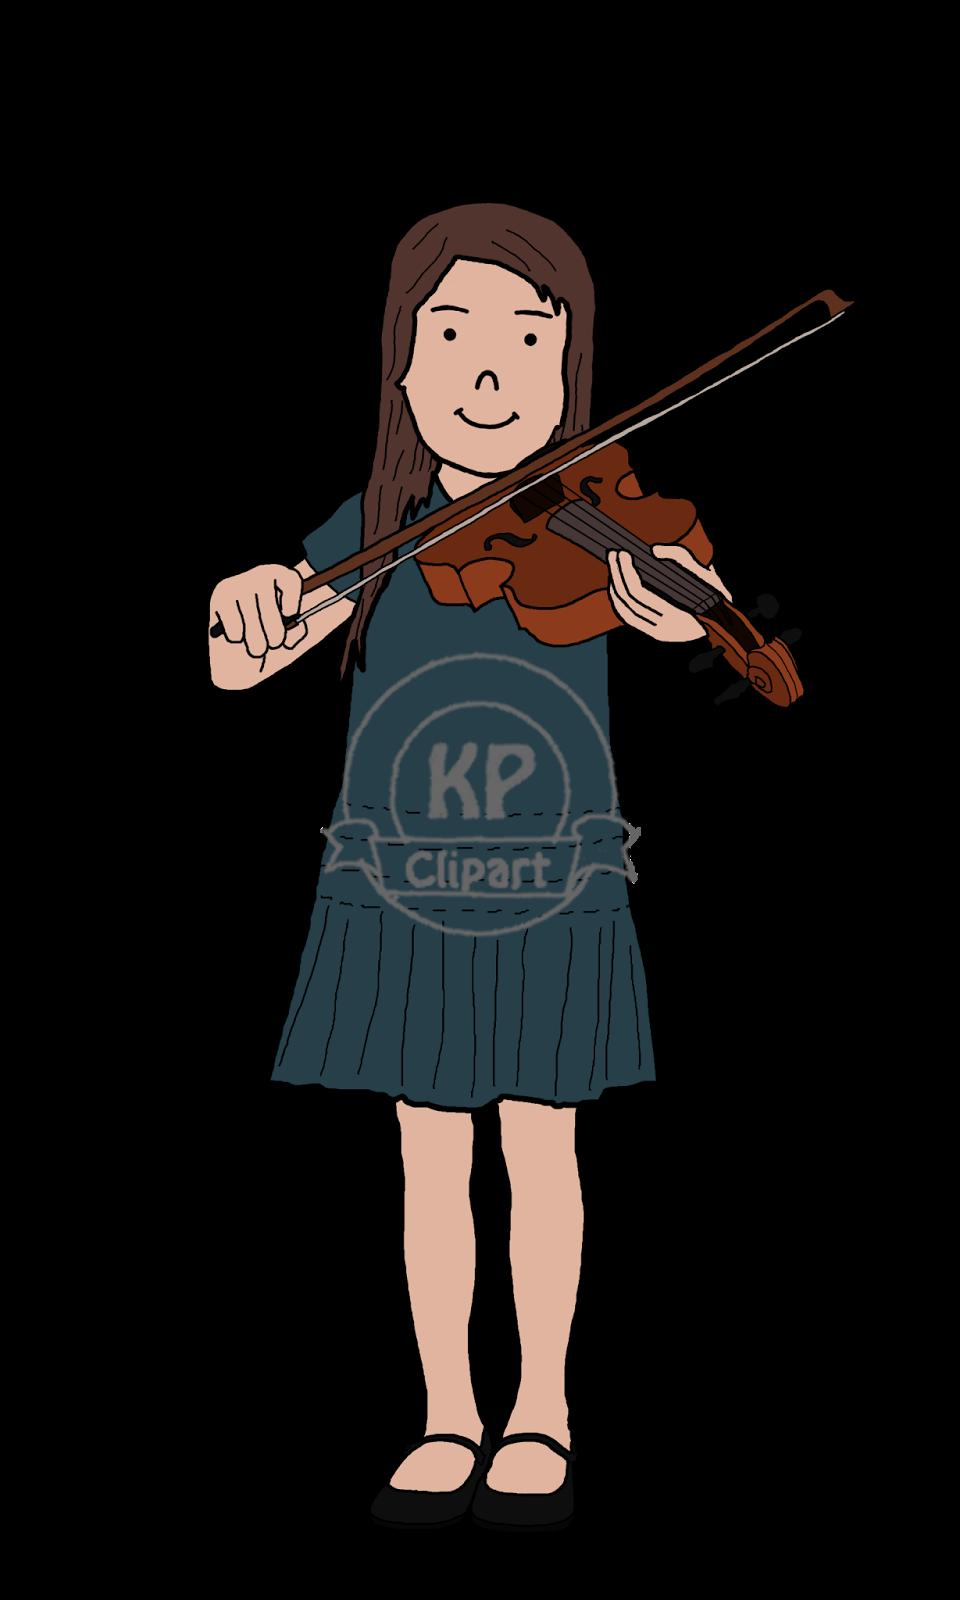 Kp friends playing music. Flutes clipart violin teacher